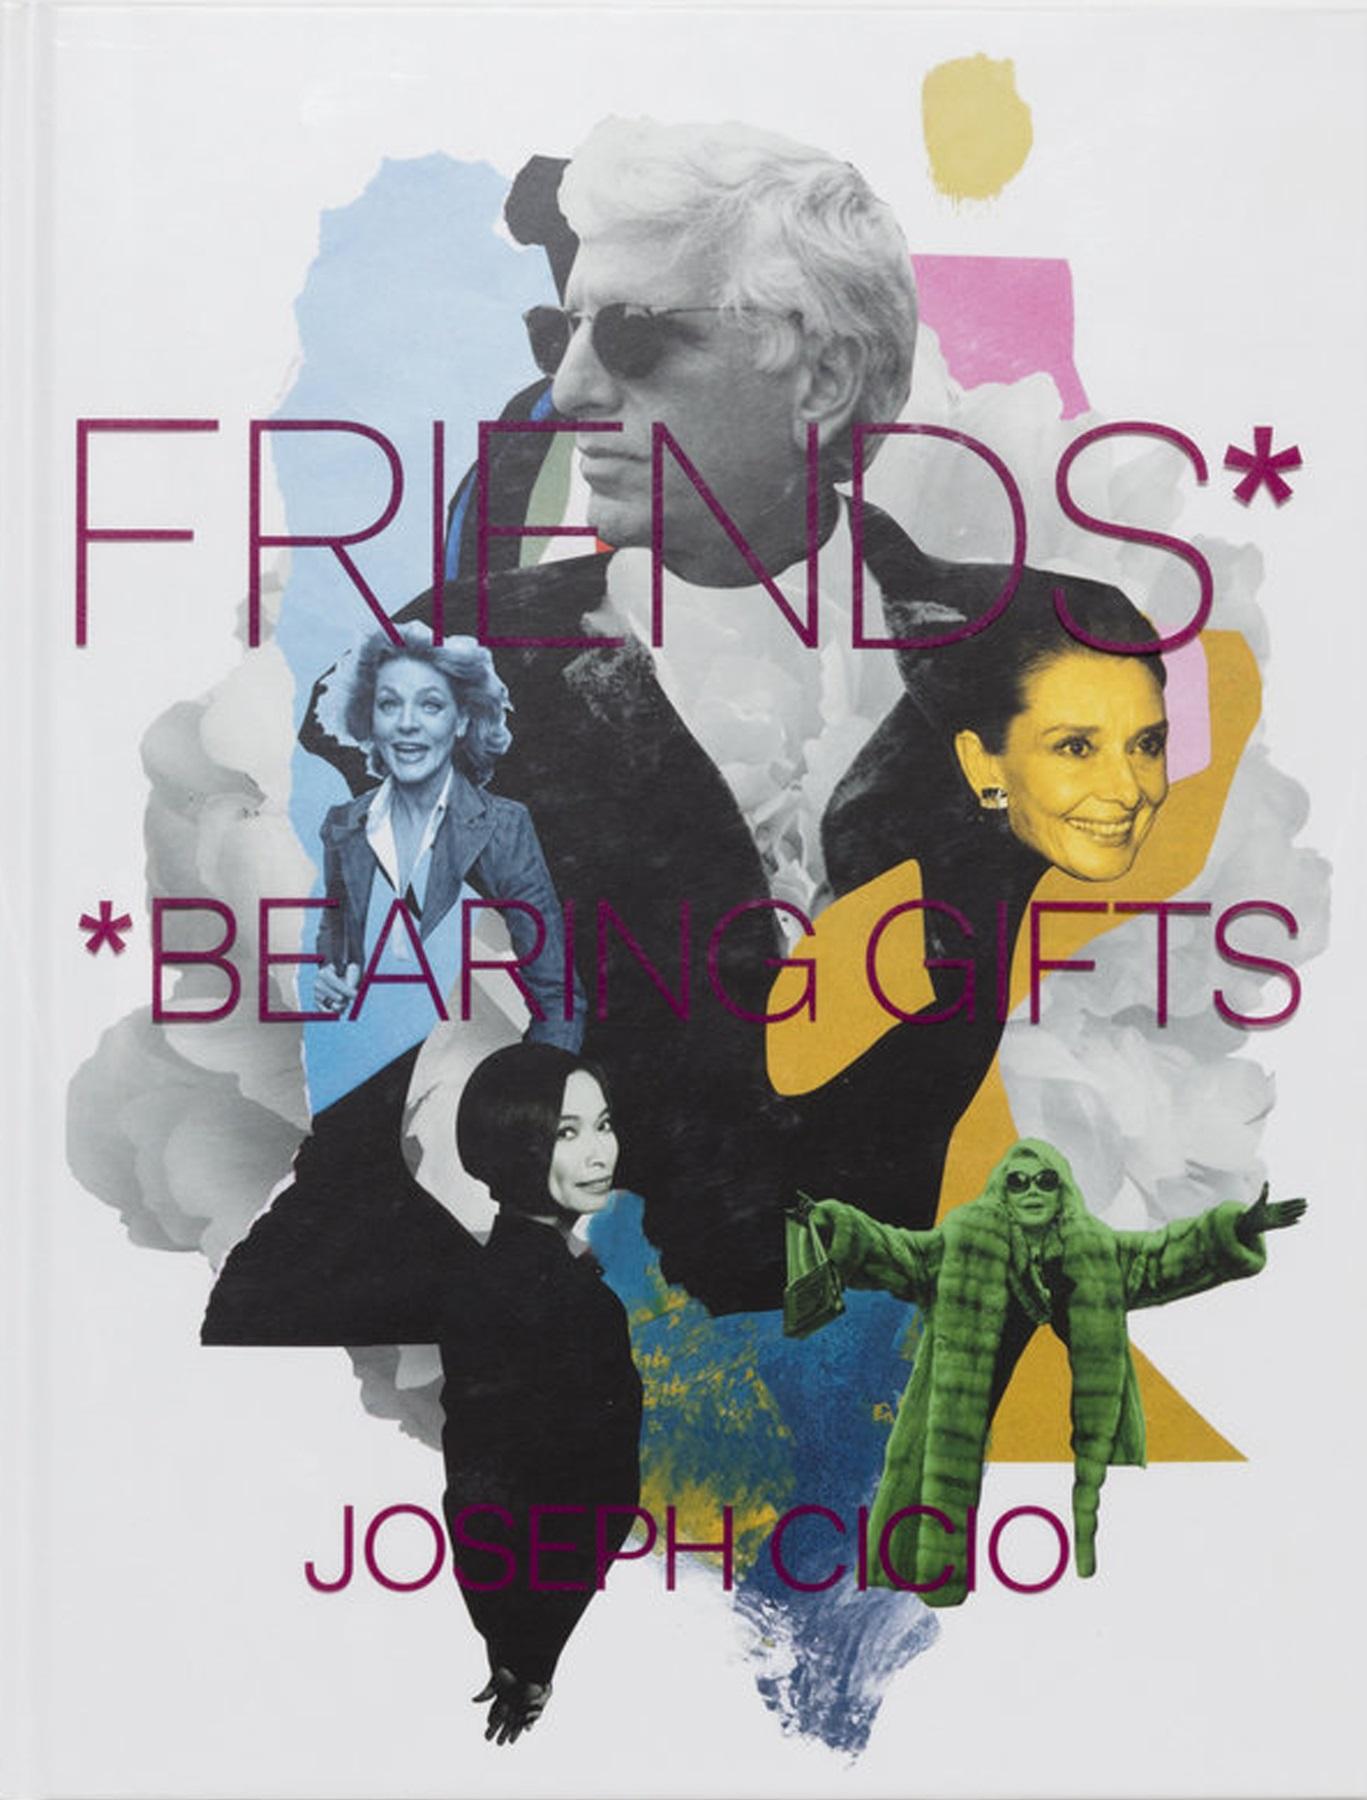 FRIENDS* *BEARING GIFTS BY JOSEPH CICIO